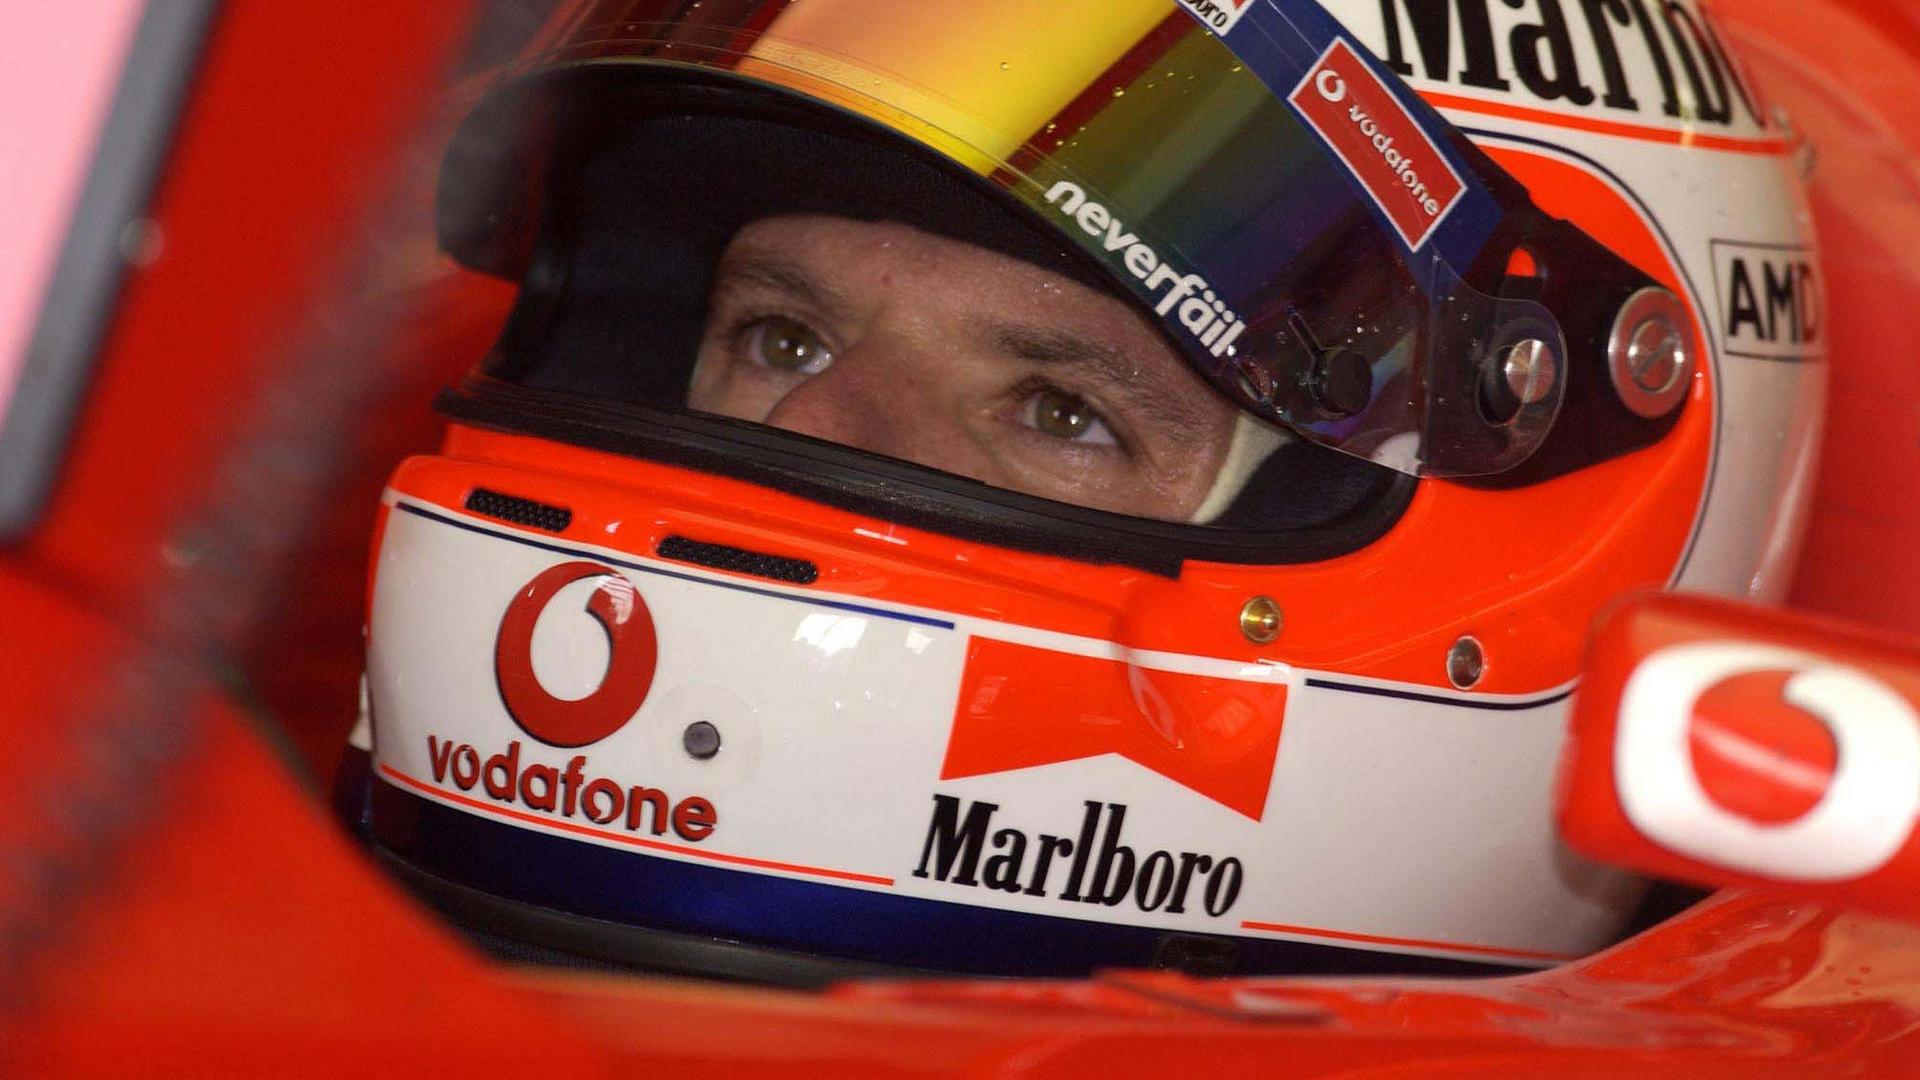 HD Wallpapers 2002 Formula 1 Grand Prix of Hungary